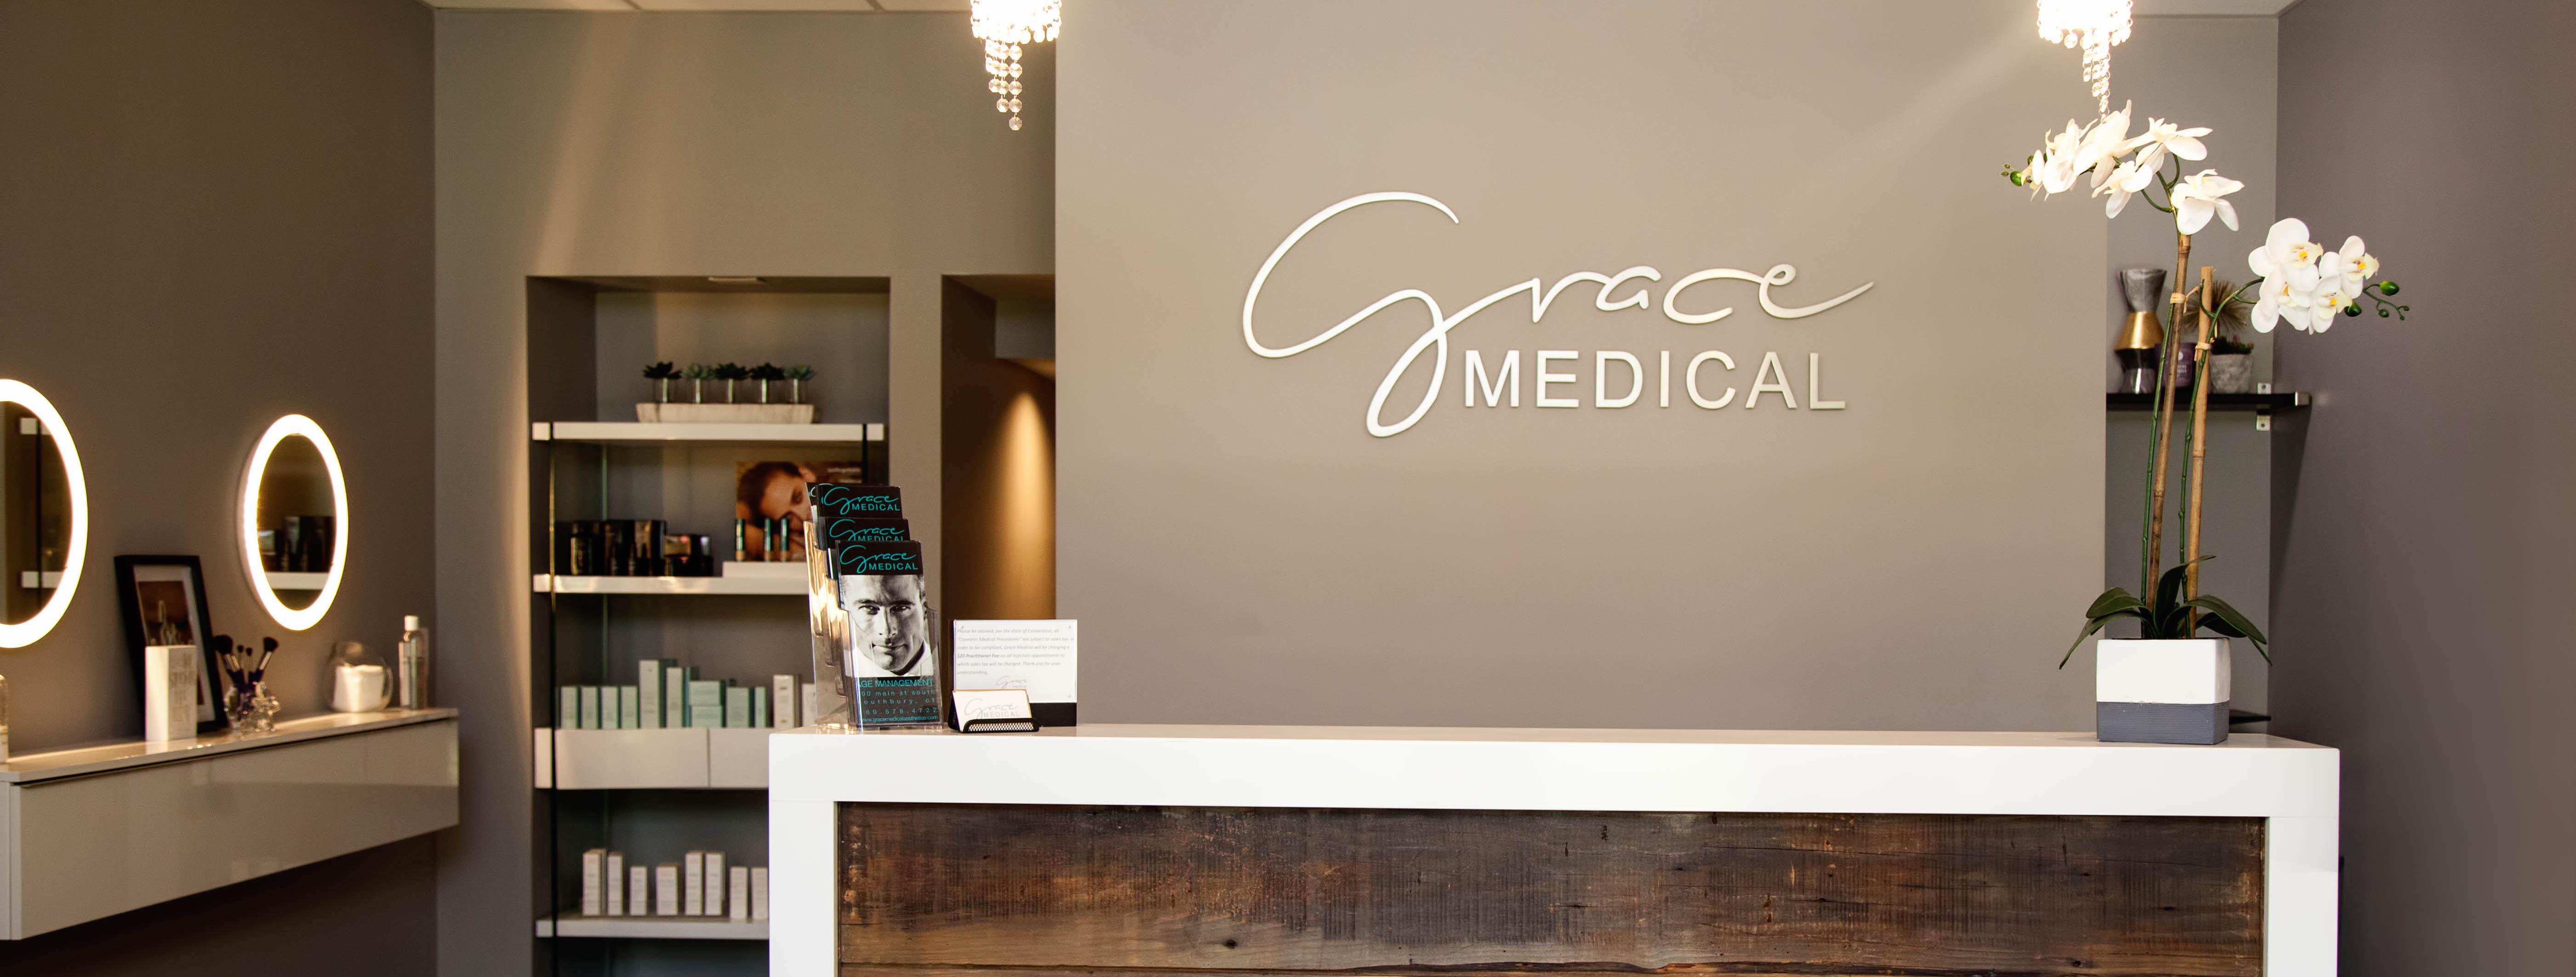 Grace Medical Aesthetics reviews | Medical Spas at 800 Main St. S - Southbury CT